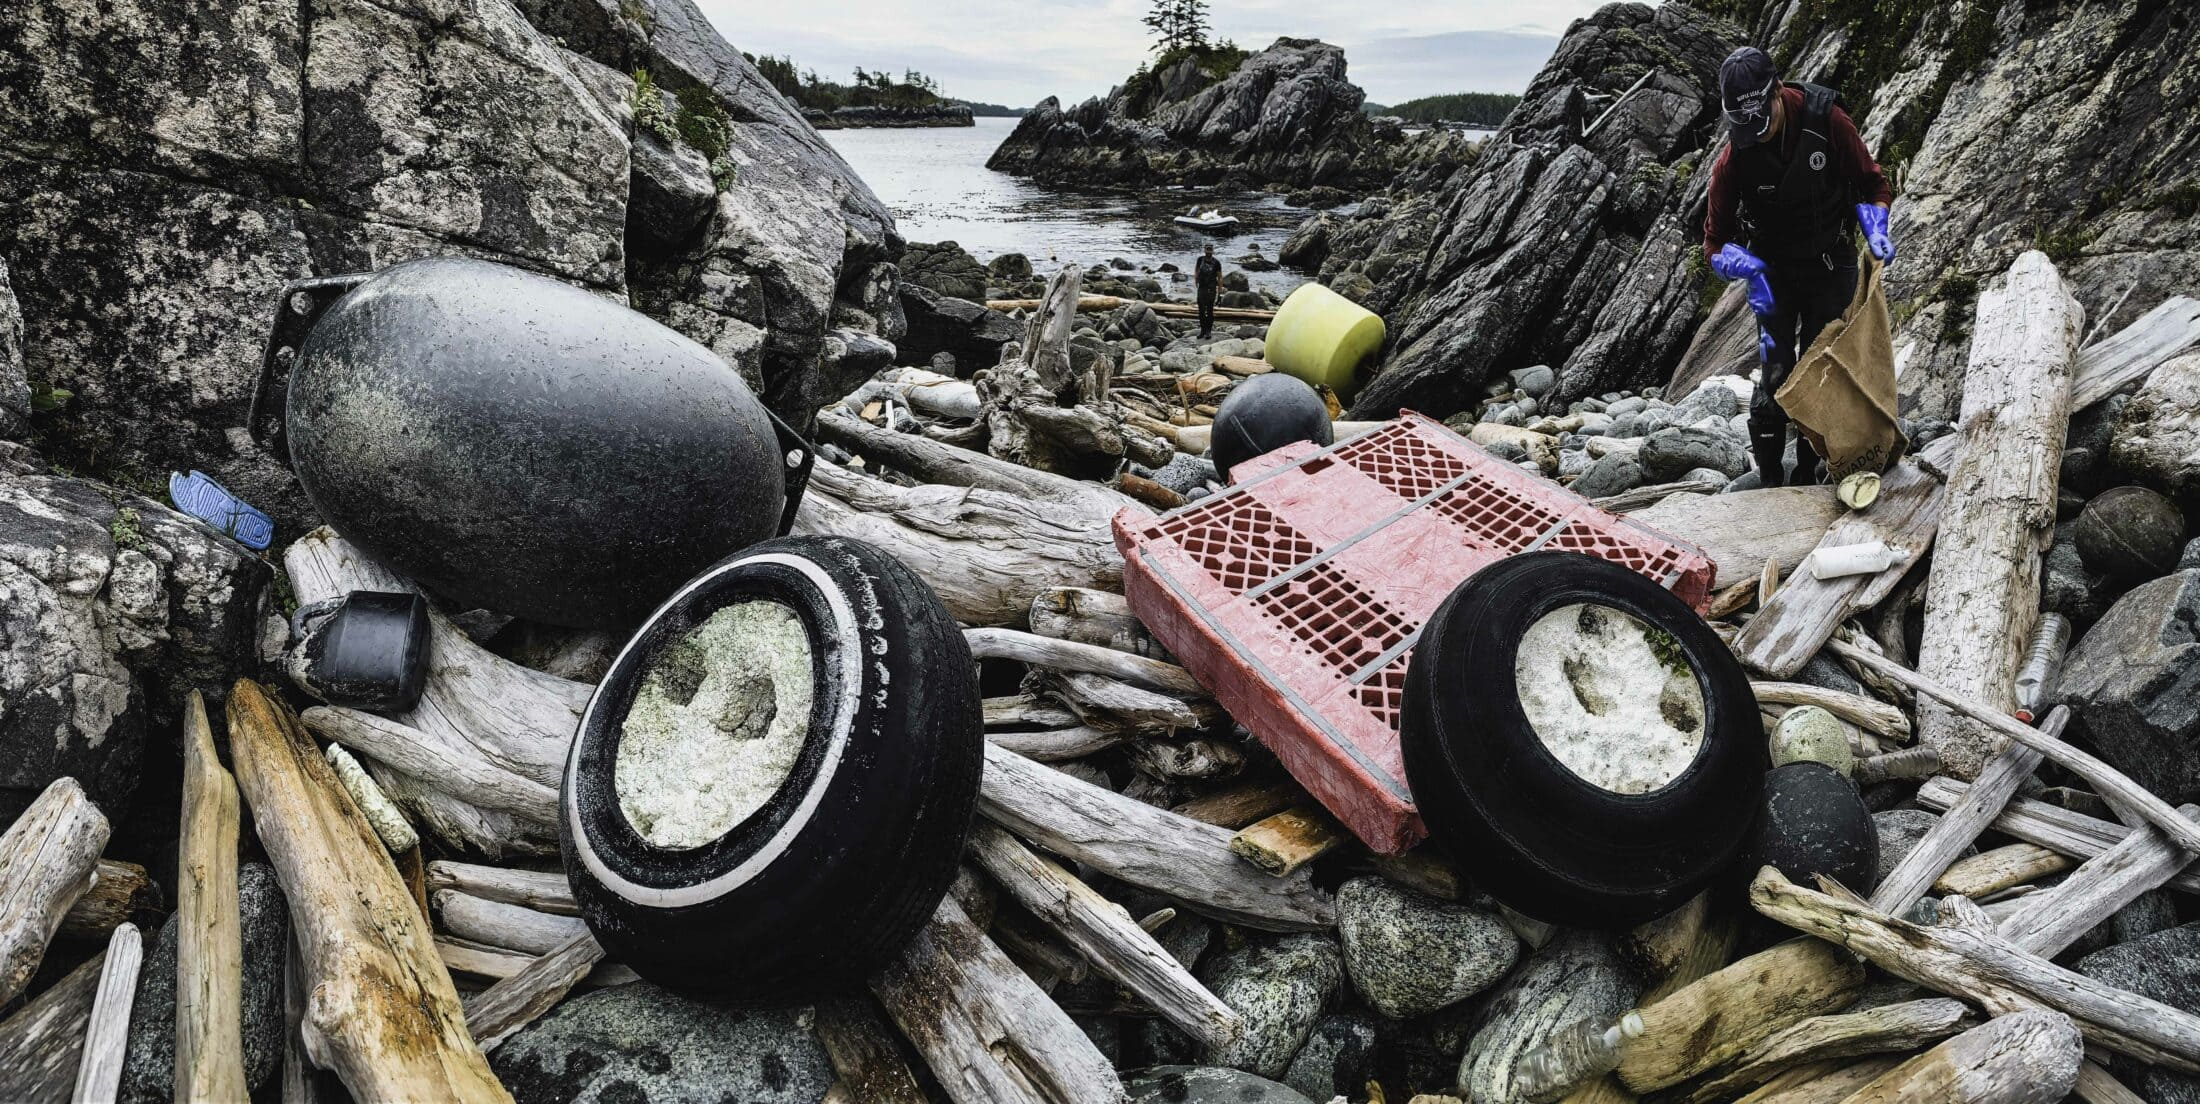 Debris on beach, Clean Coast, Clean Waters Initiative